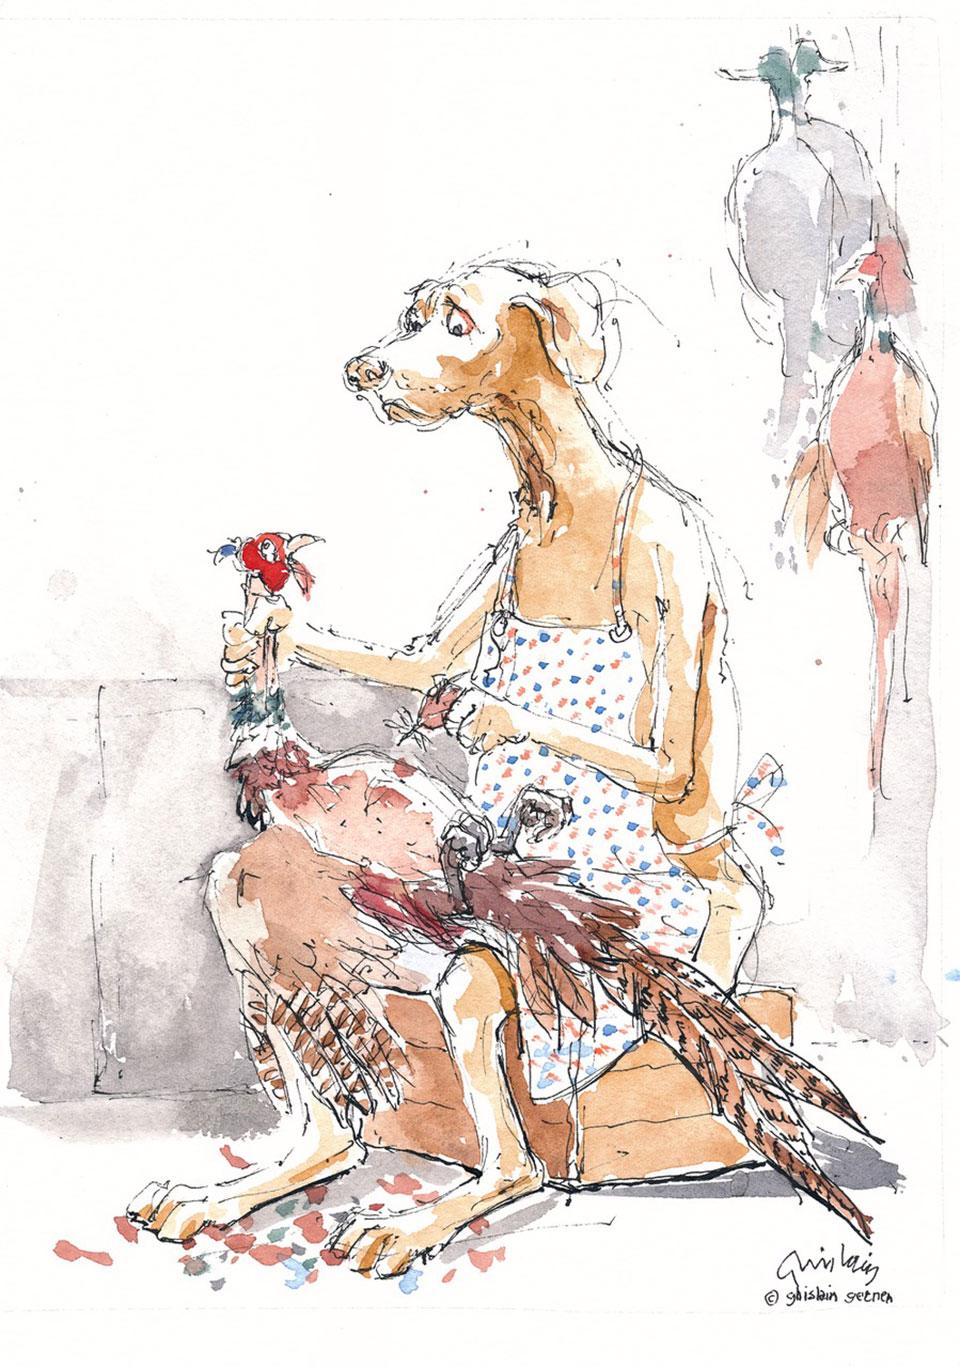 Vesper, the visla, getting to work on pheasant plucking.